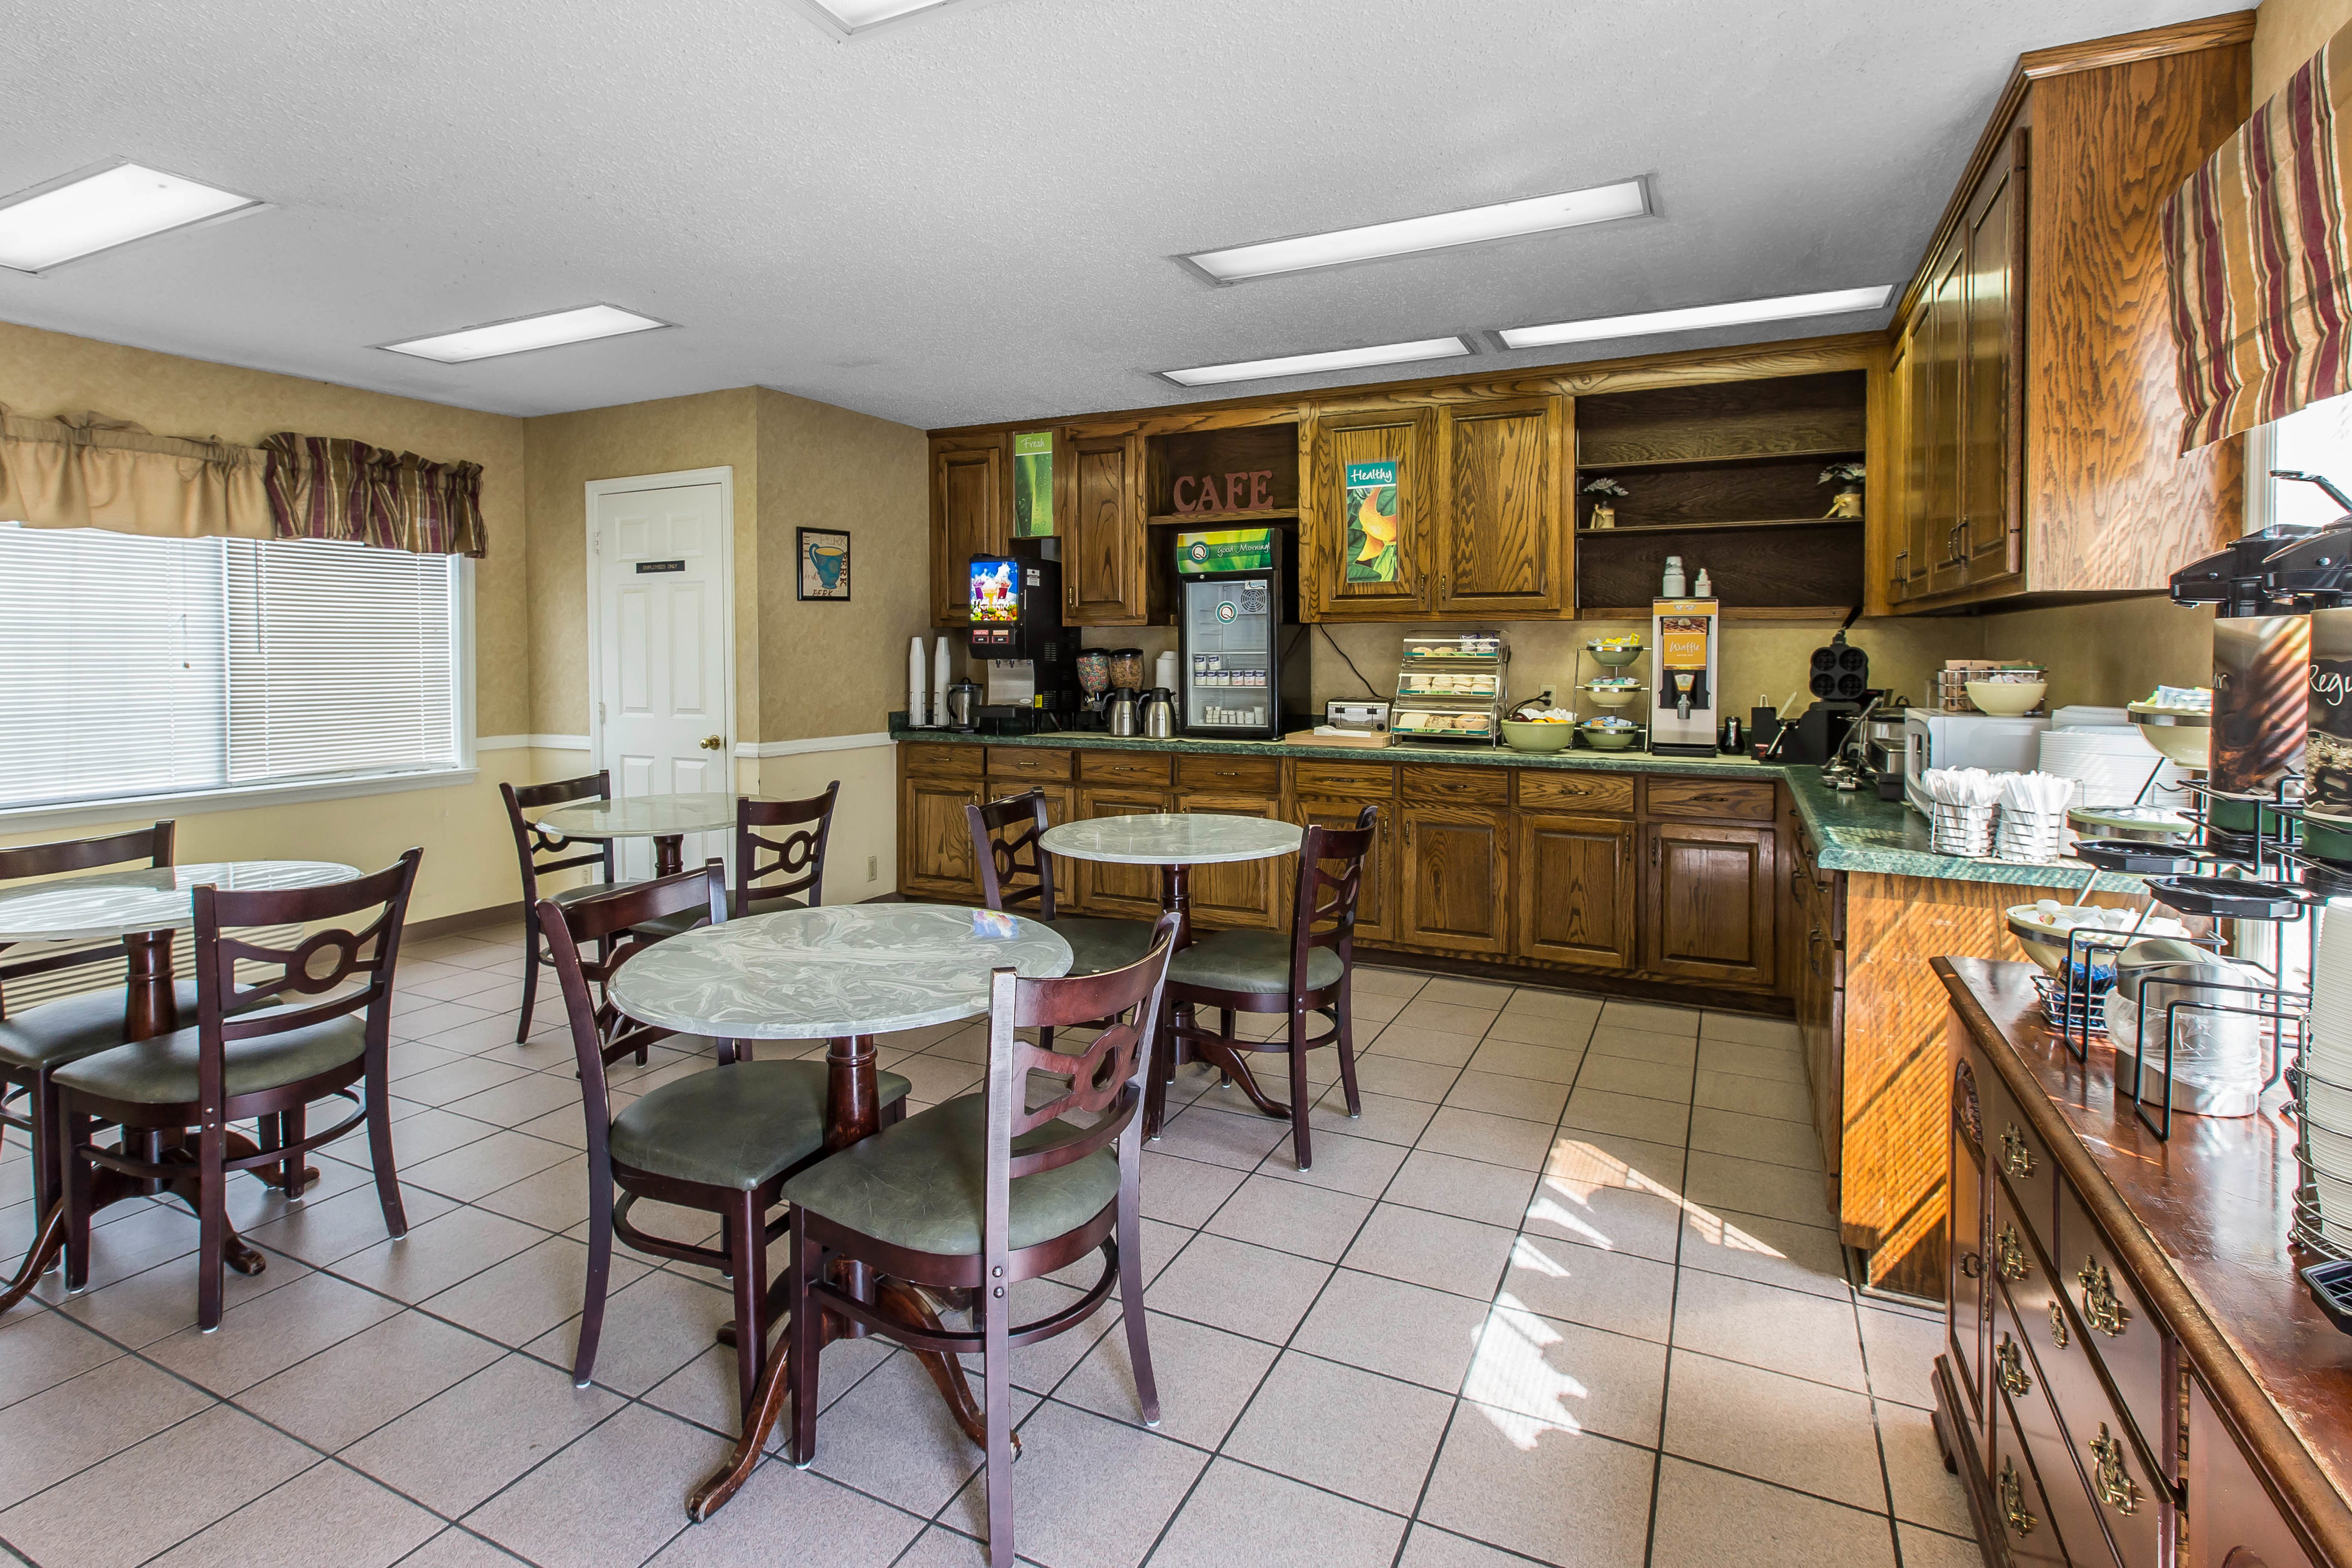 quality inn in jesup ga 31545. Black Bedroom Furniture Sets. Home Design Ideas